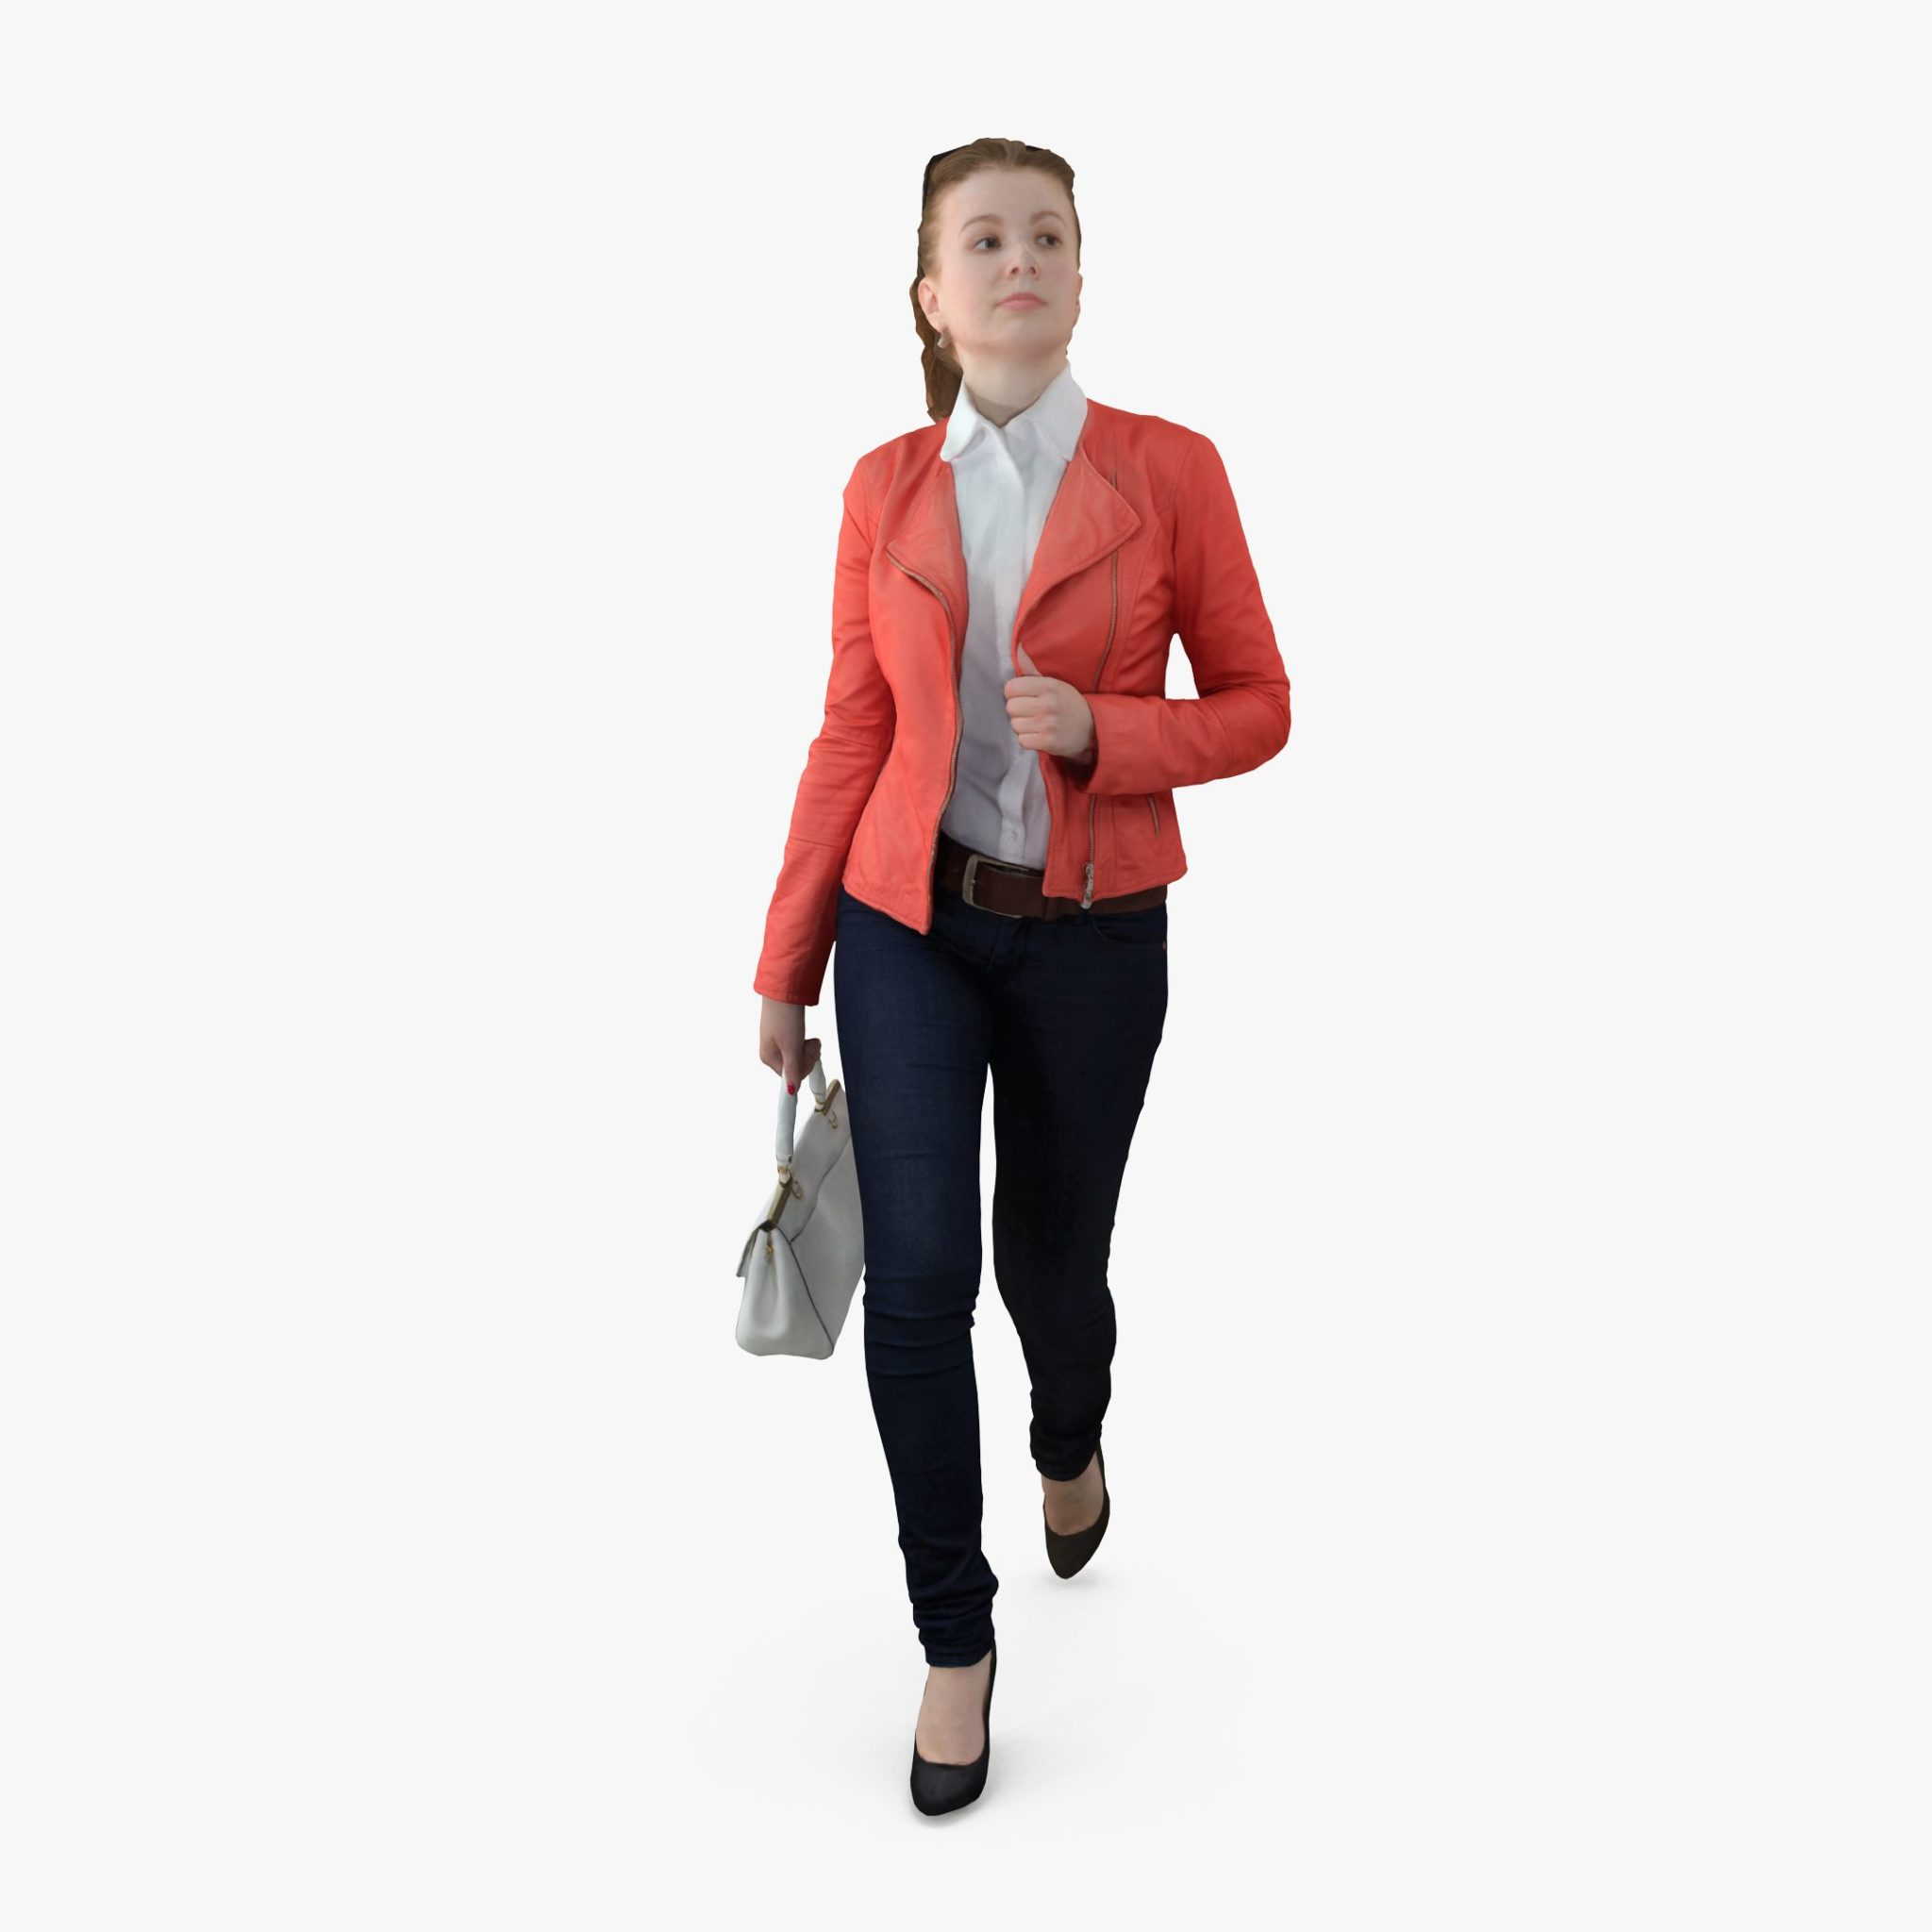 City Female Walking 3D Model | 3DTree Scanning Studio